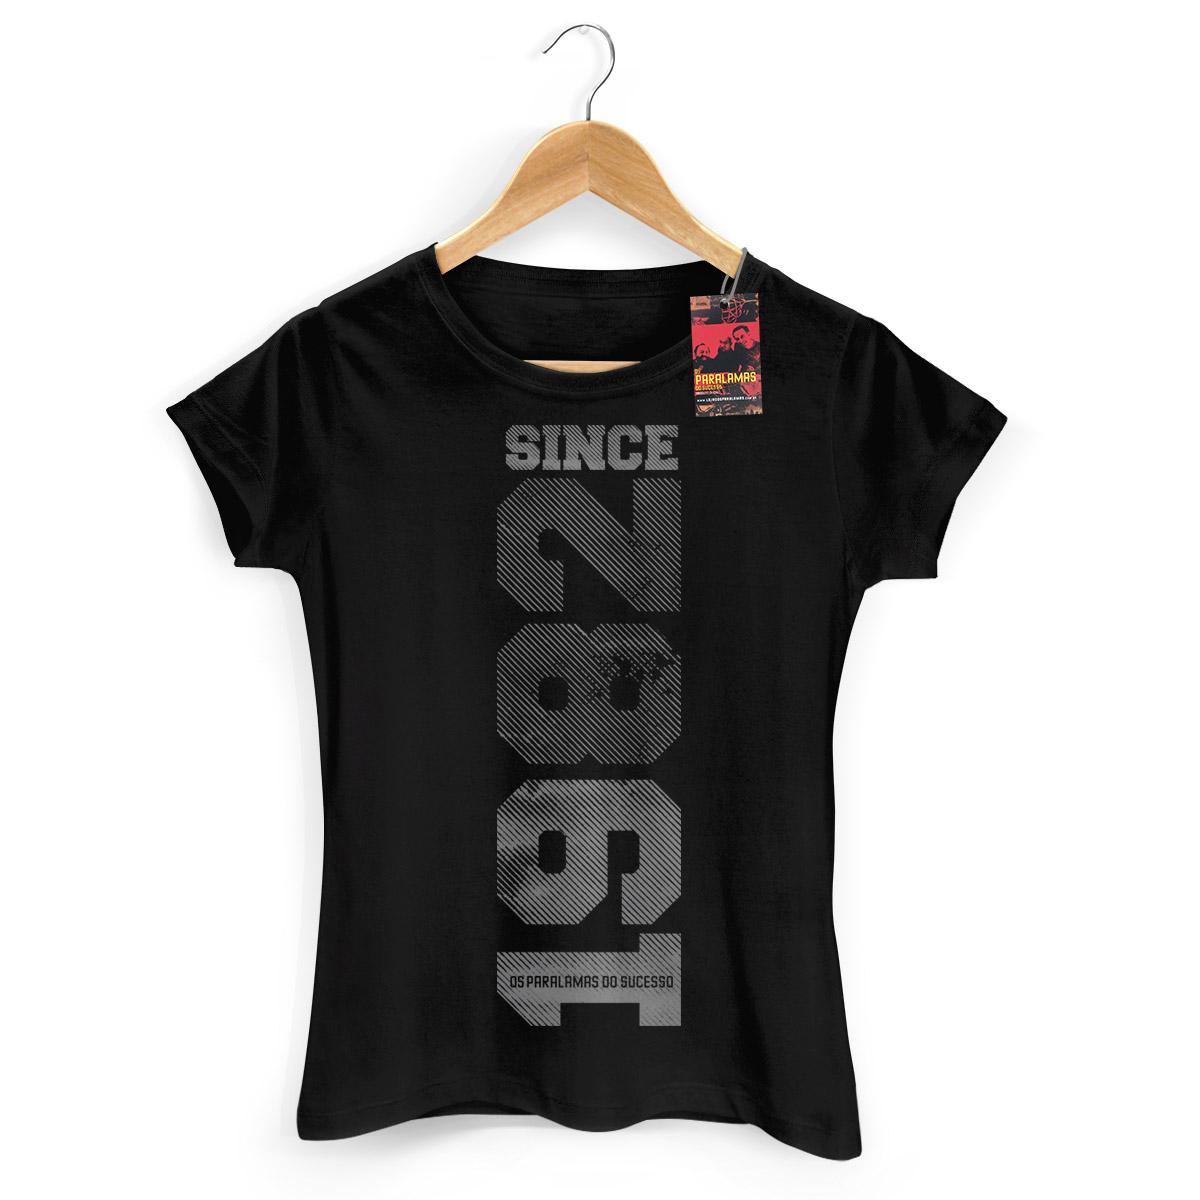 Camiseta Feminina Os Paralamas do Sucesso Since 1982 Preta  - bandUP Store Marketplace